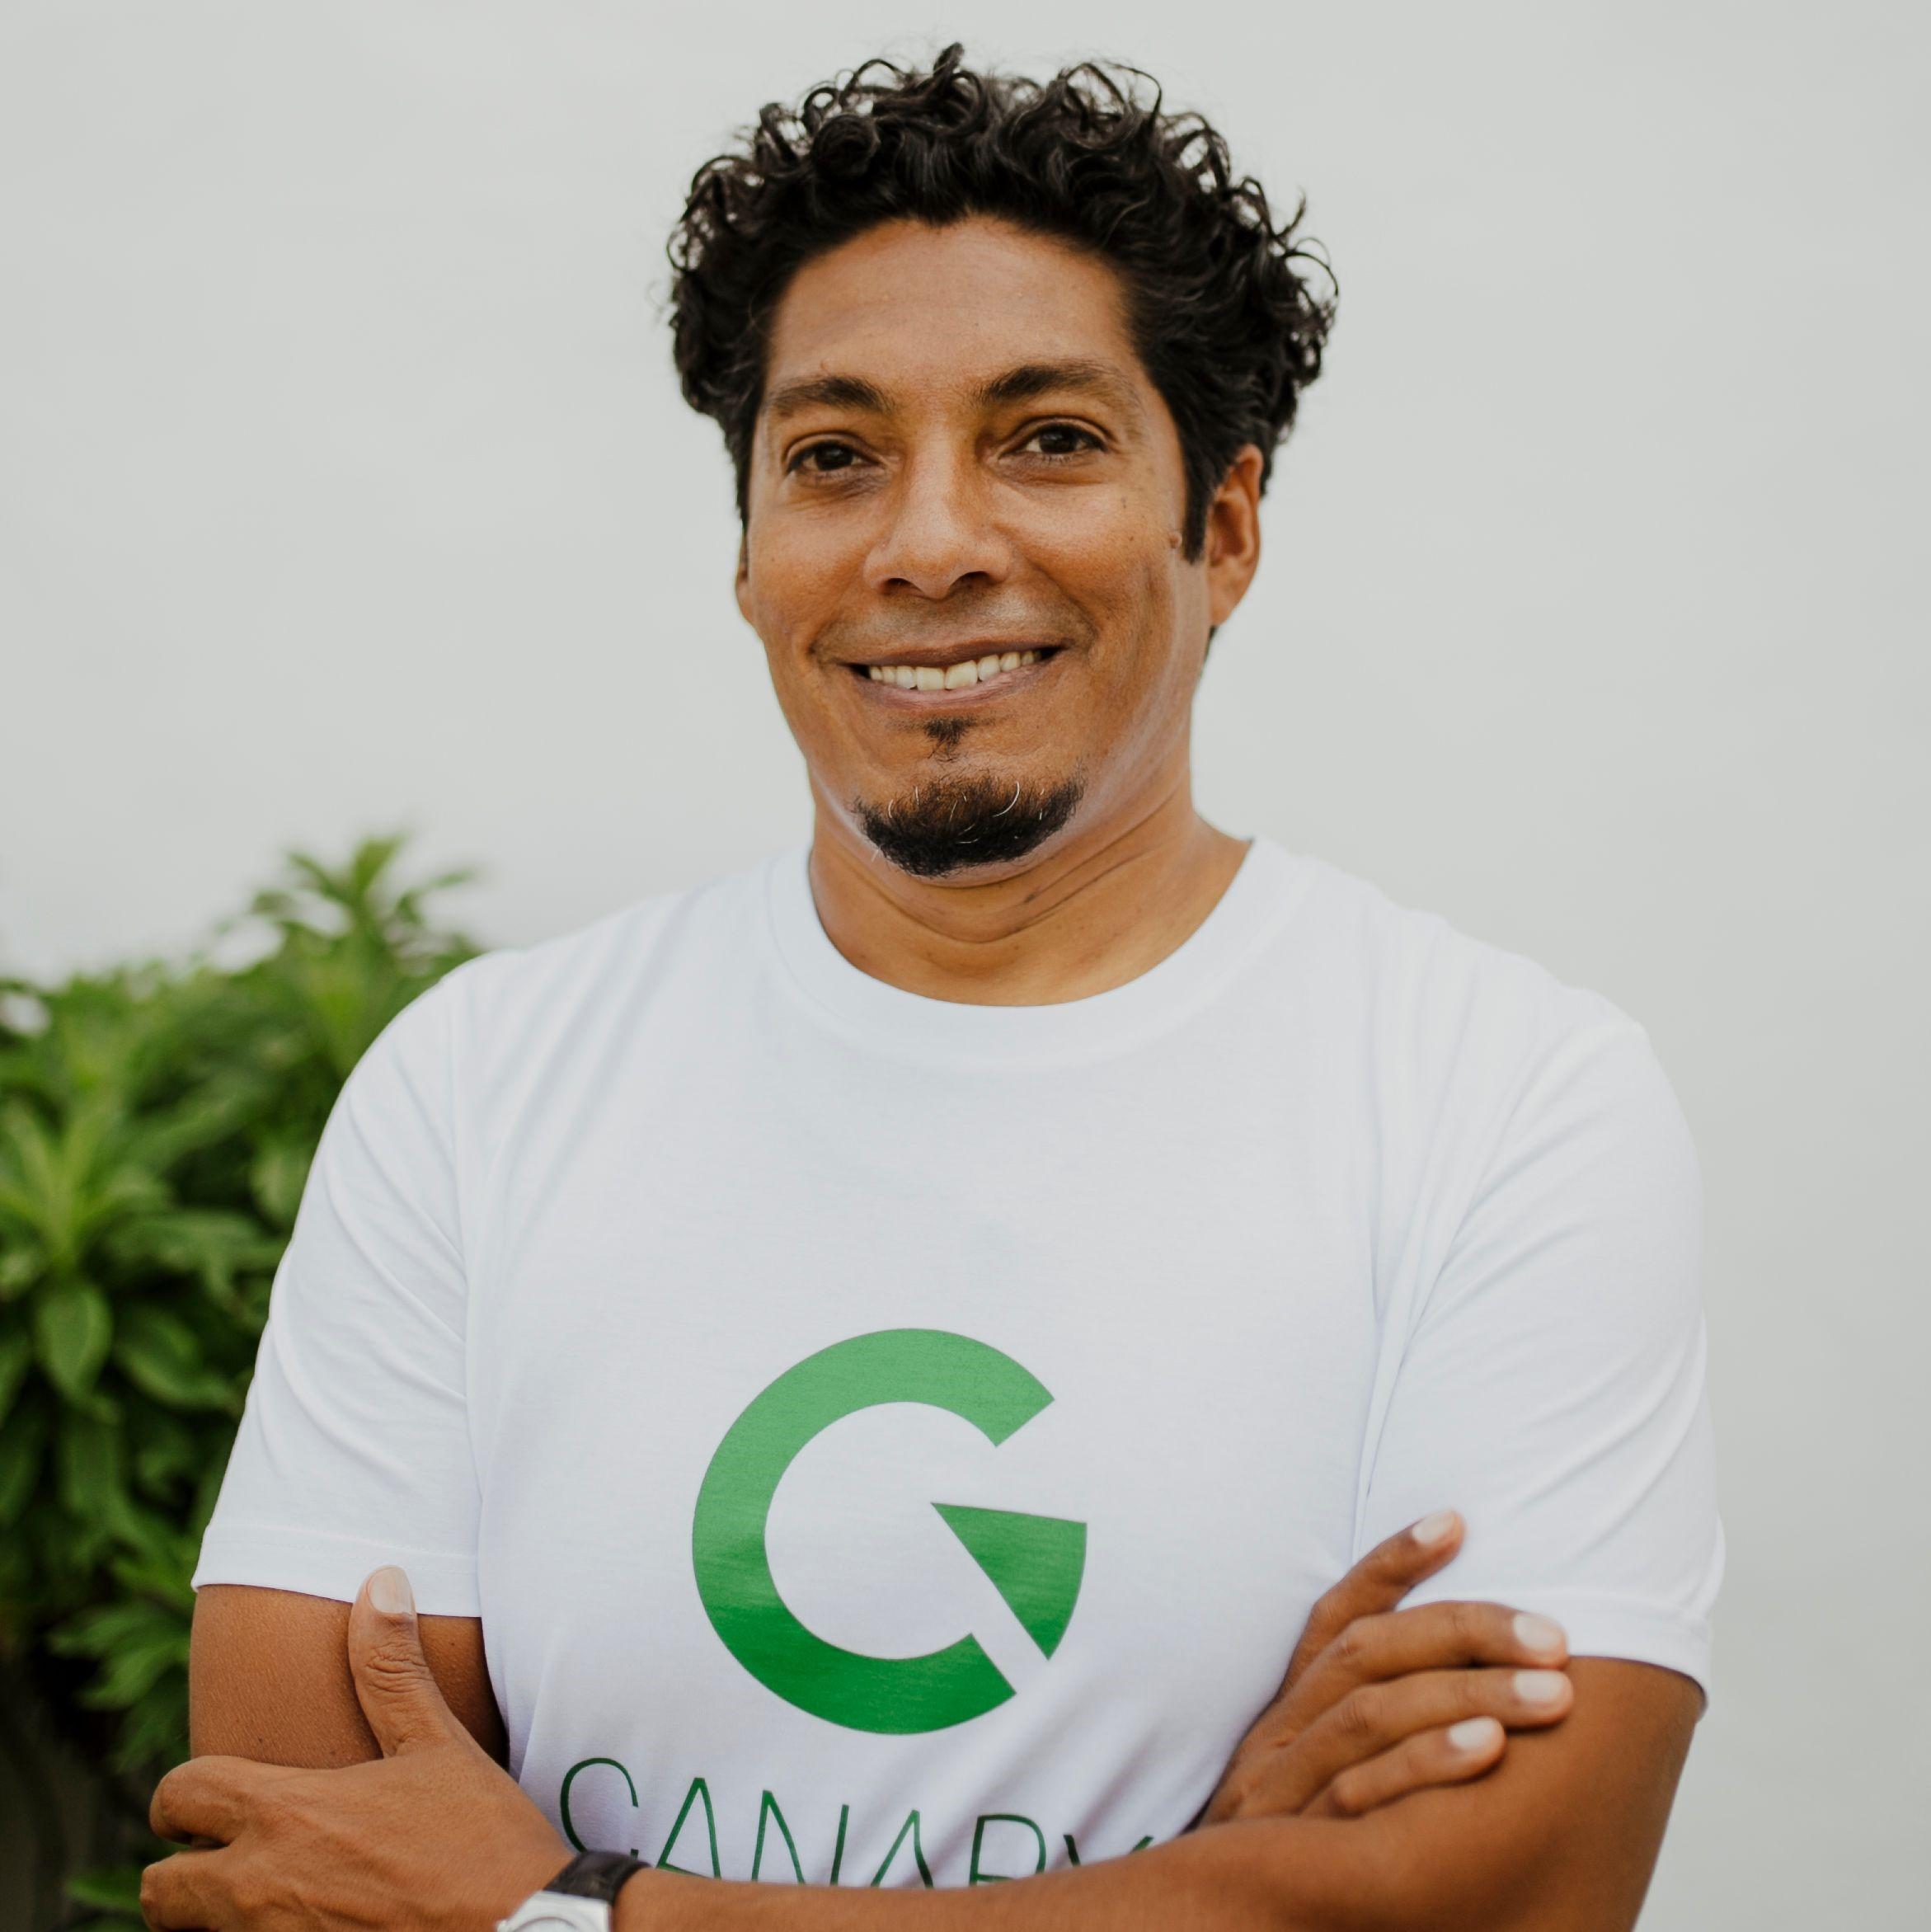 Titus Ruiz Canary Green